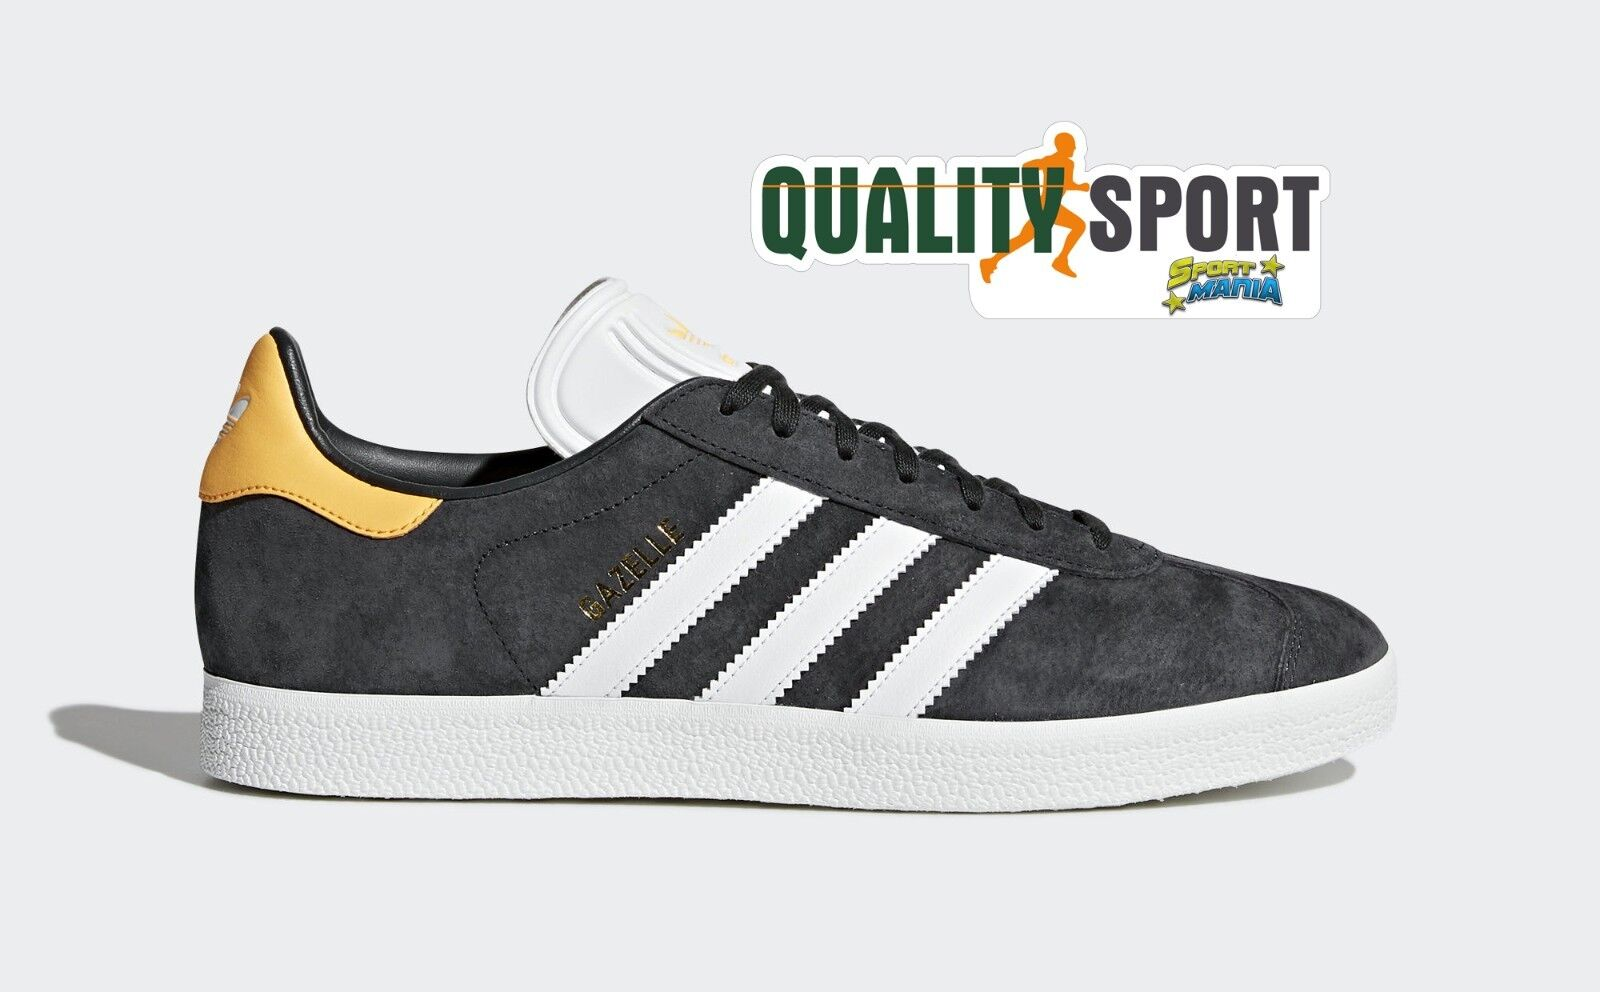 Adidas Gazelle Sportive Grigio Arancio Schuhe Schuhes Uomo Sportive Gazelle Sneakers CQ2807 2018 3d7fba